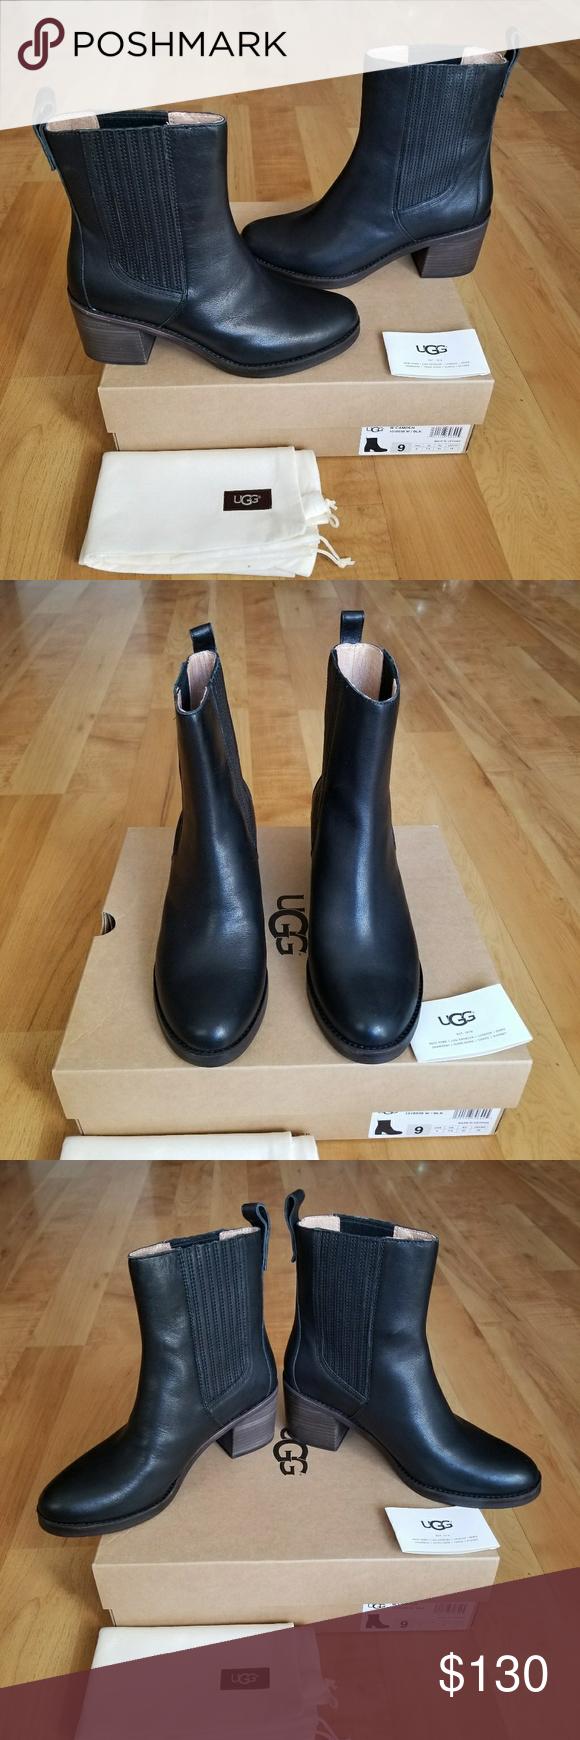 79febc8917a UGG Shoes | Ugg Boots | Color: Black | Size: 9 | My Posh Picks | Ugg ...